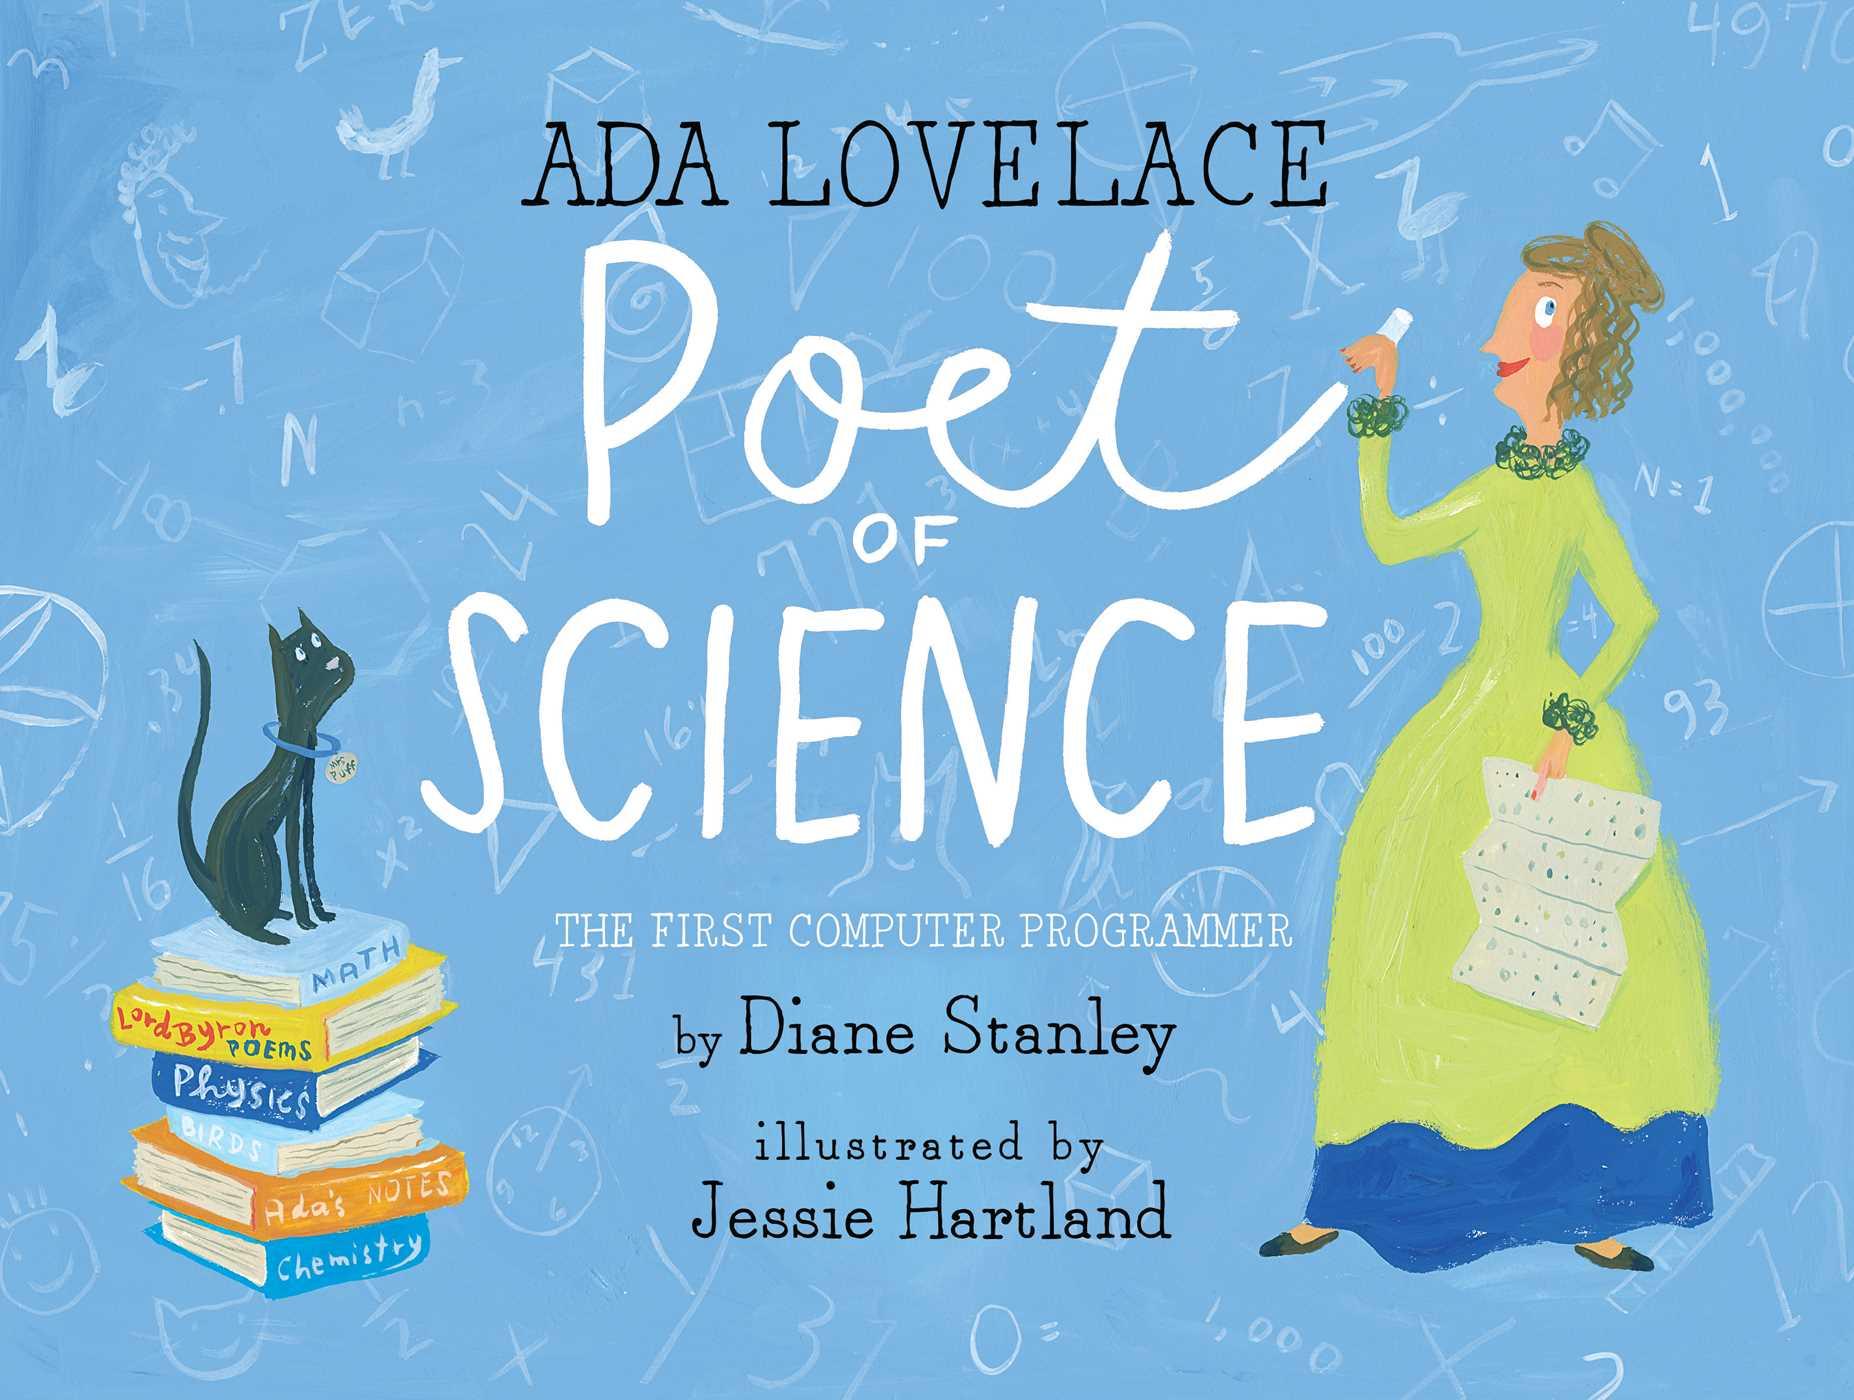 Ada lovelace poet of science 9781481452502 hr